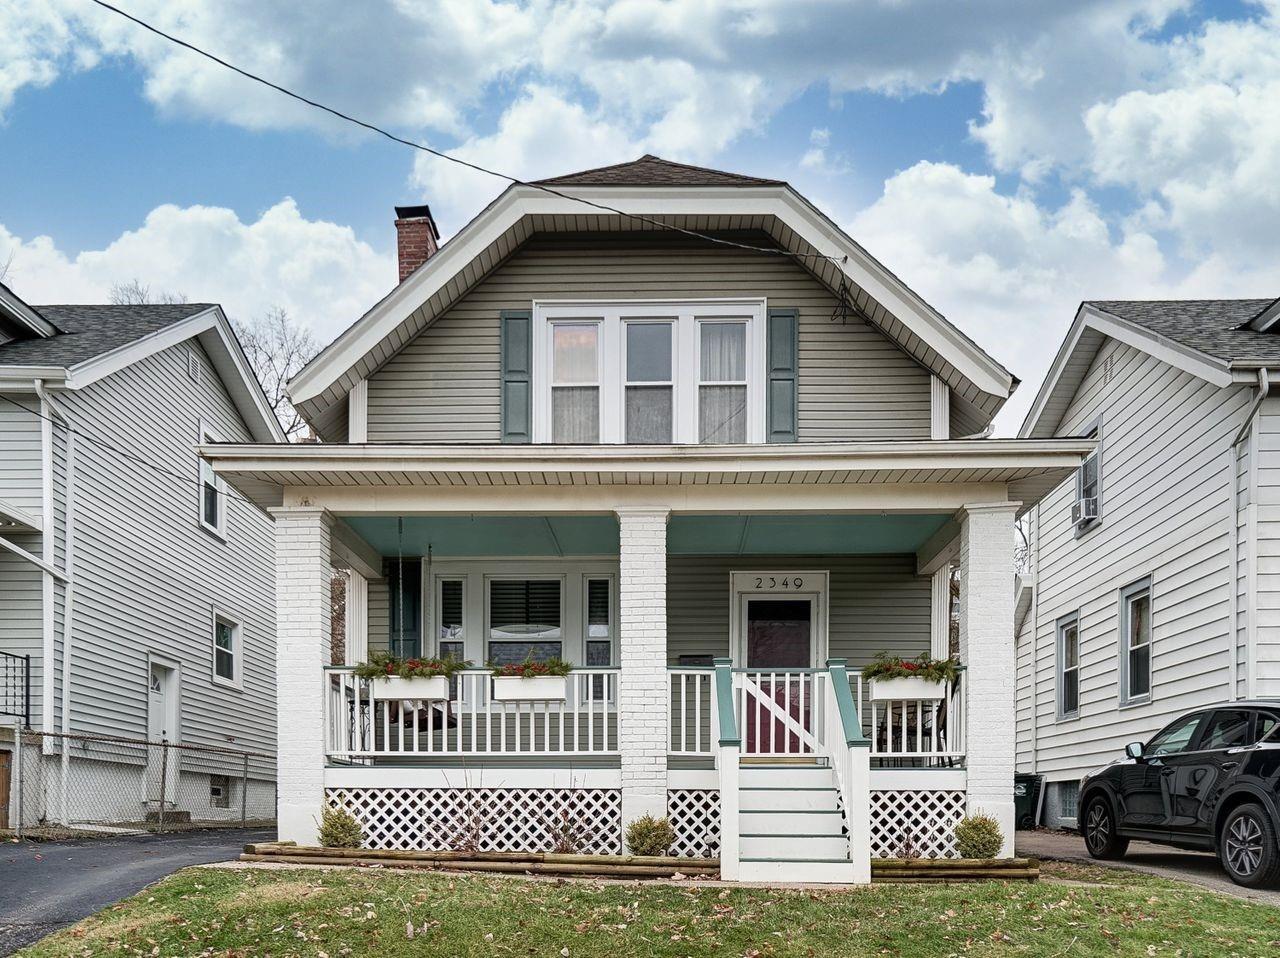 2349 Glenside Ave Norwood, OH